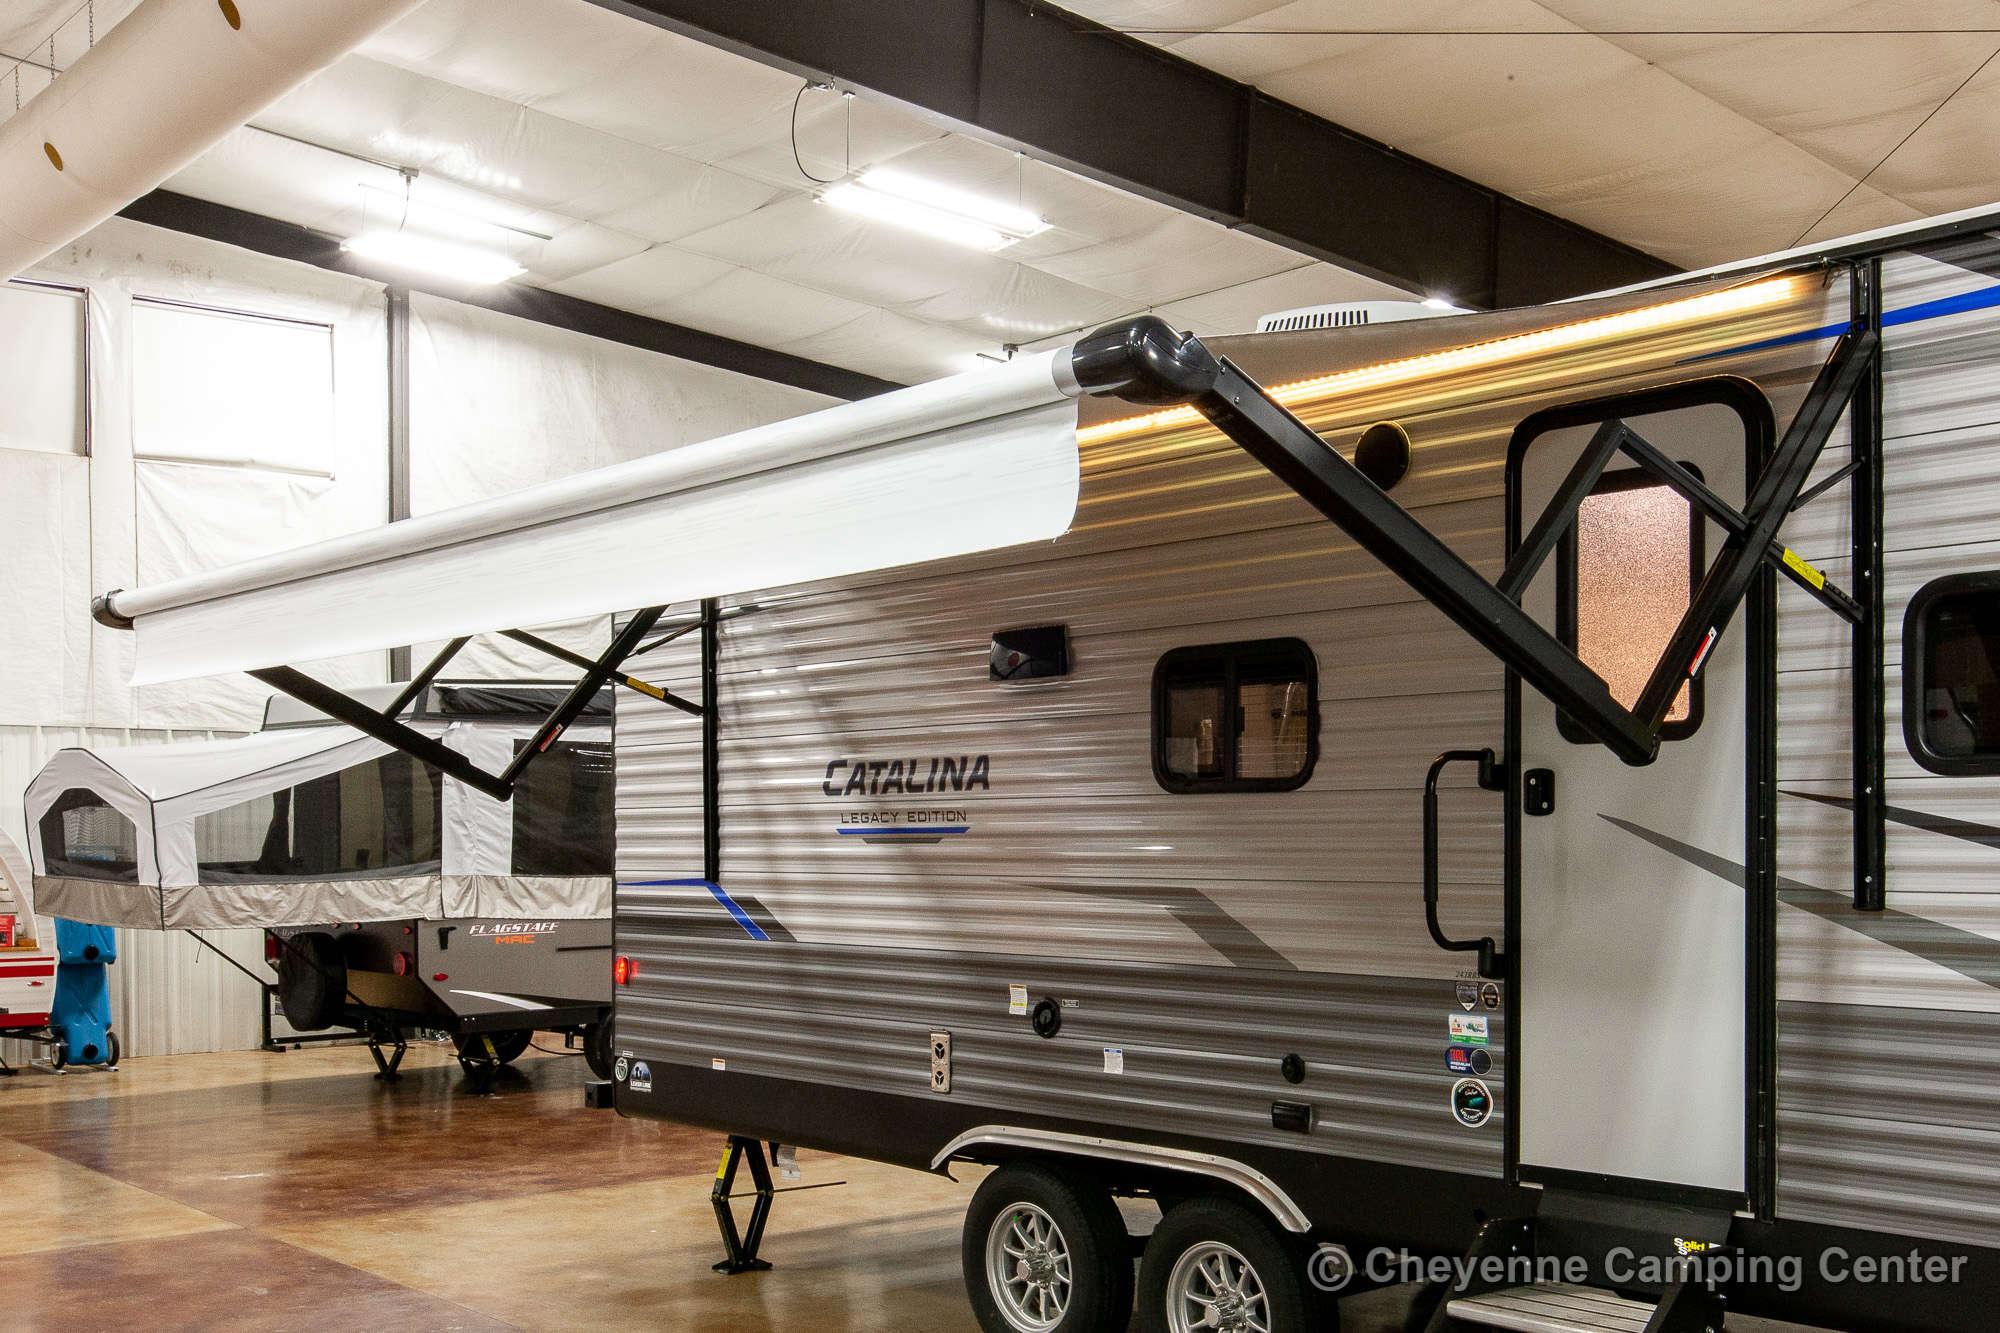 2021 Coachmen Catalina Legacy Edition 243RBS Travel Trailer Exterior Image